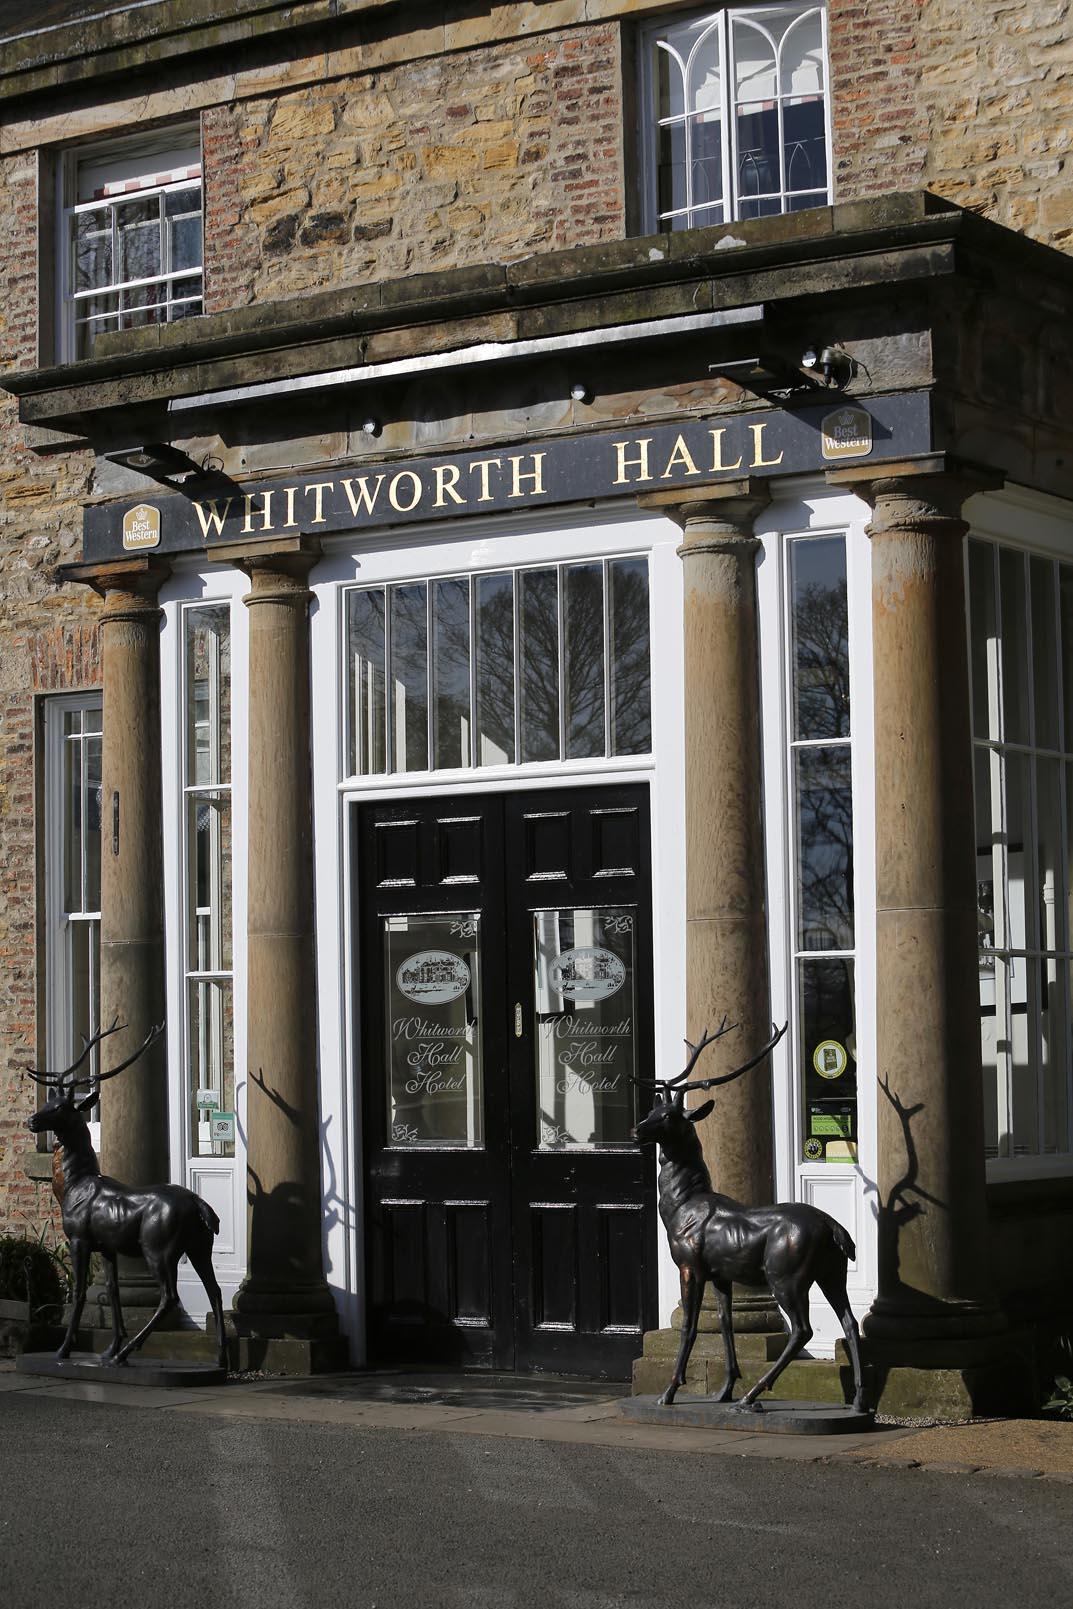 Best Western Hotel Room: Best Western Whitworth Hall Hotel